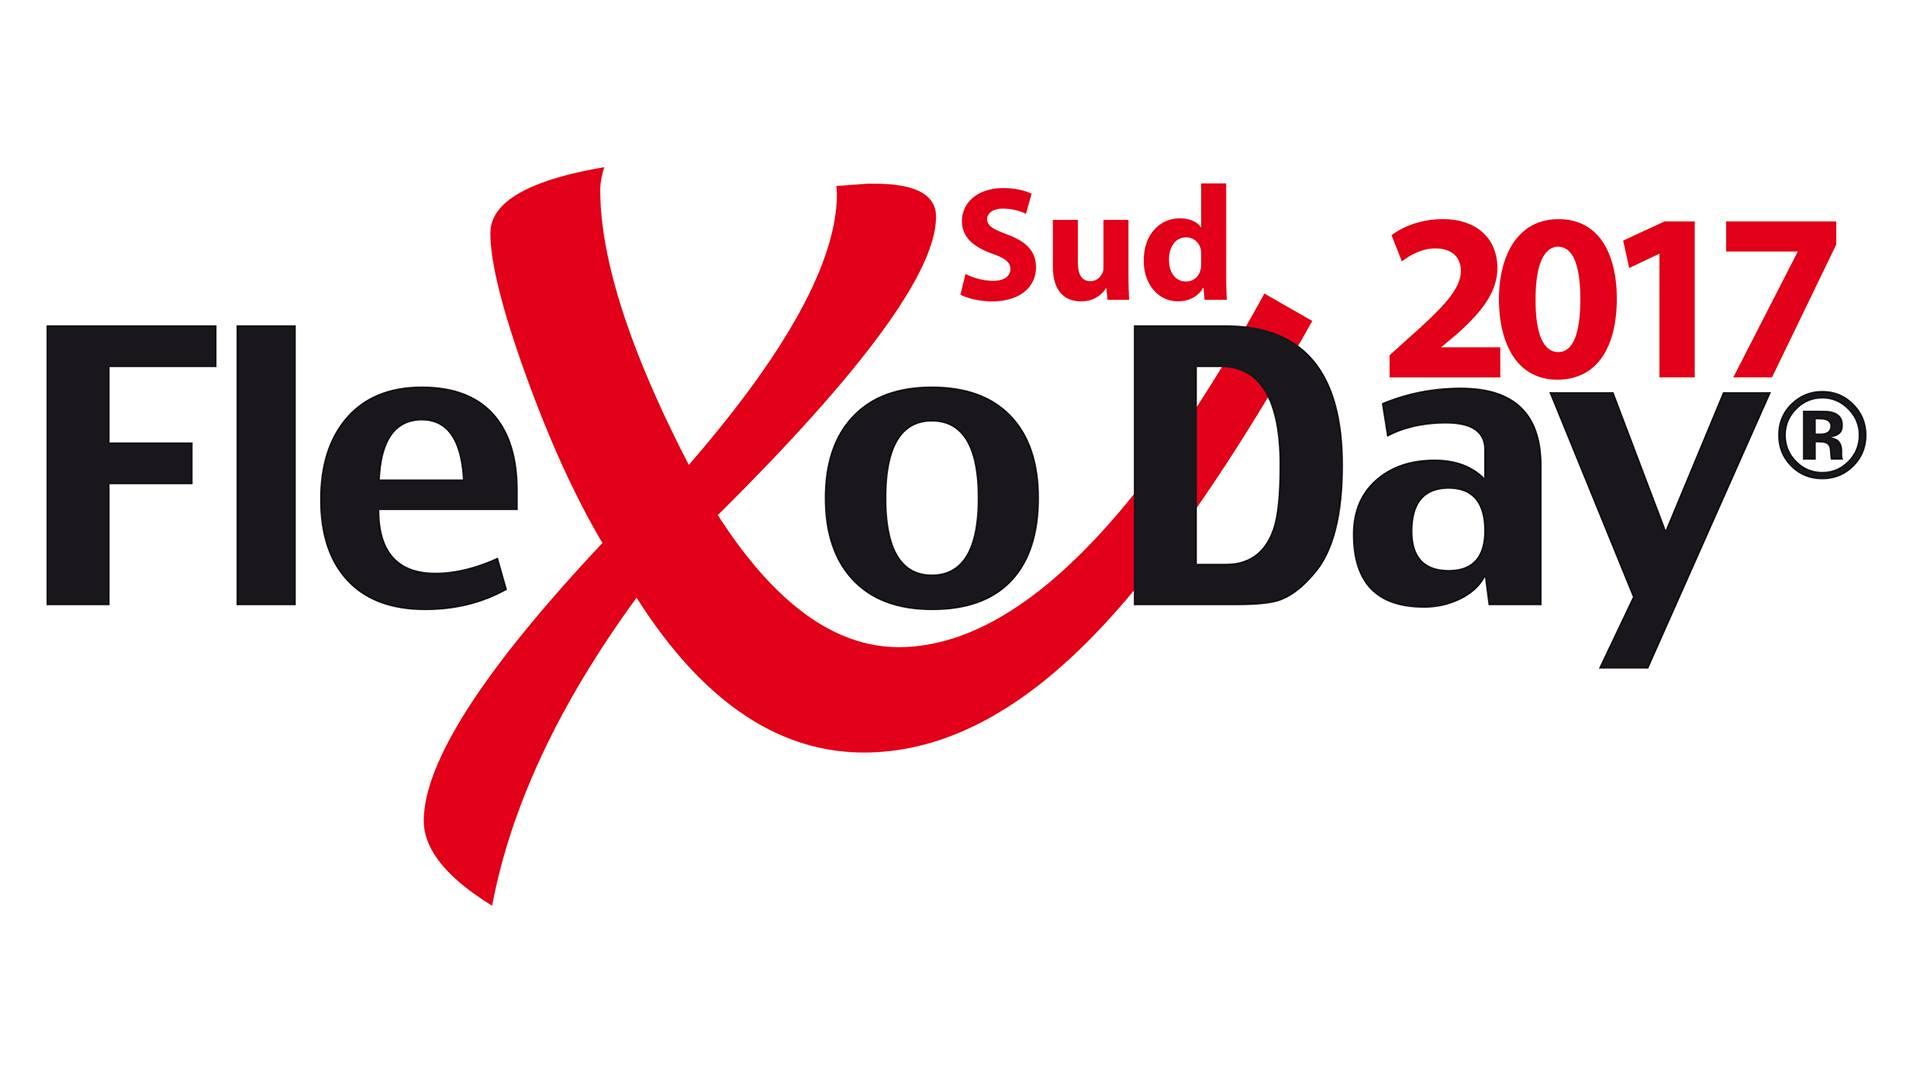 FlexoDay Sud 2017